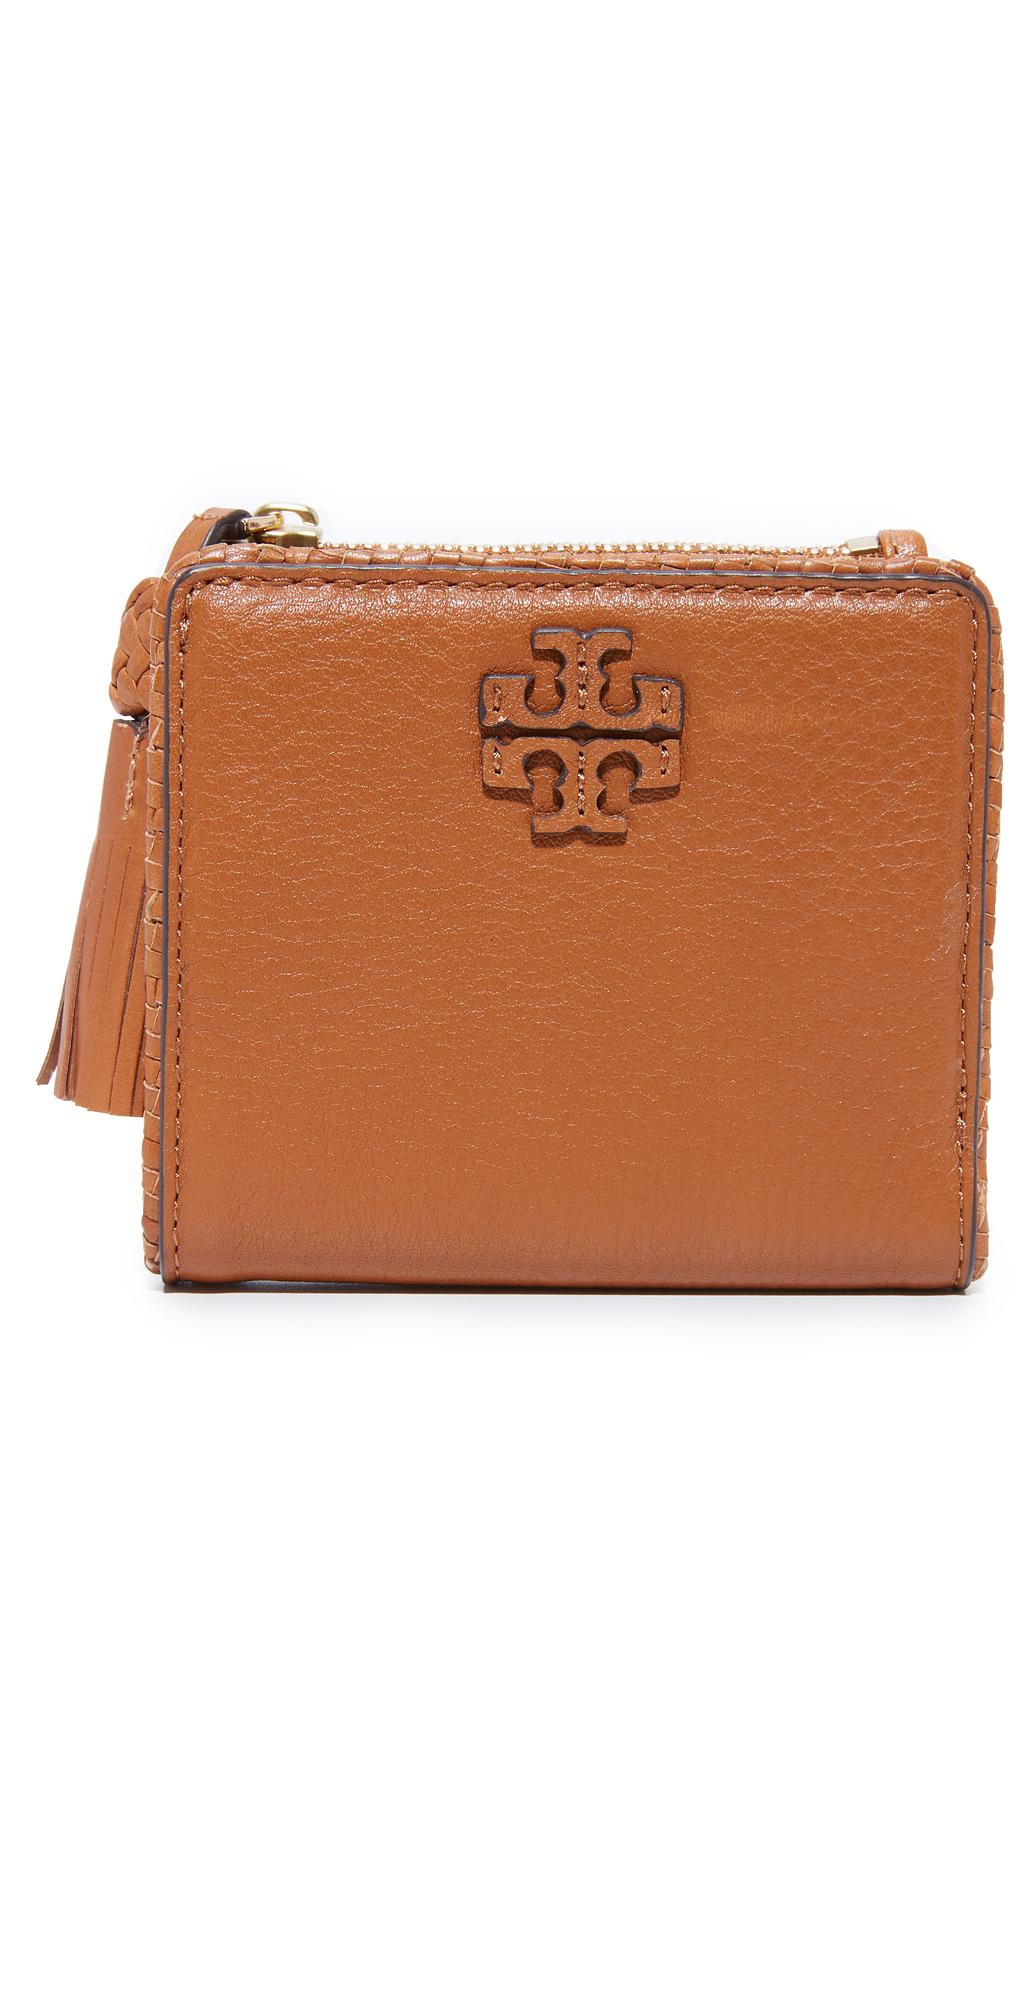 Taylor Mini Wallet Tory Burch